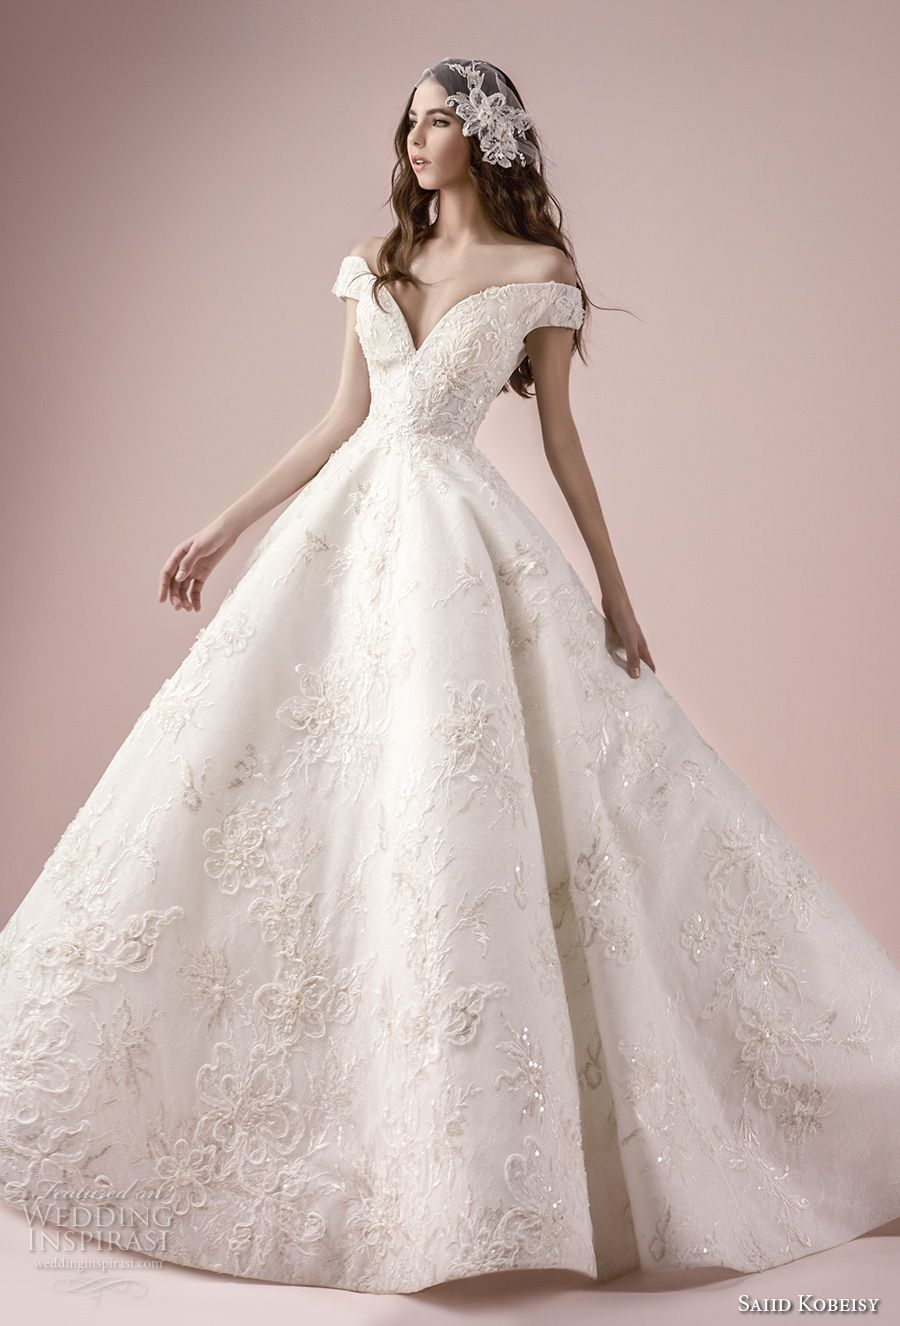 e94659c46493d saiid kobeisy 2018 bridal off the shoulder v neck full embellishment  romantic princess a line wedding dress (3270) mv -- Saiid Kobeisy 2018  Wedding Dresses